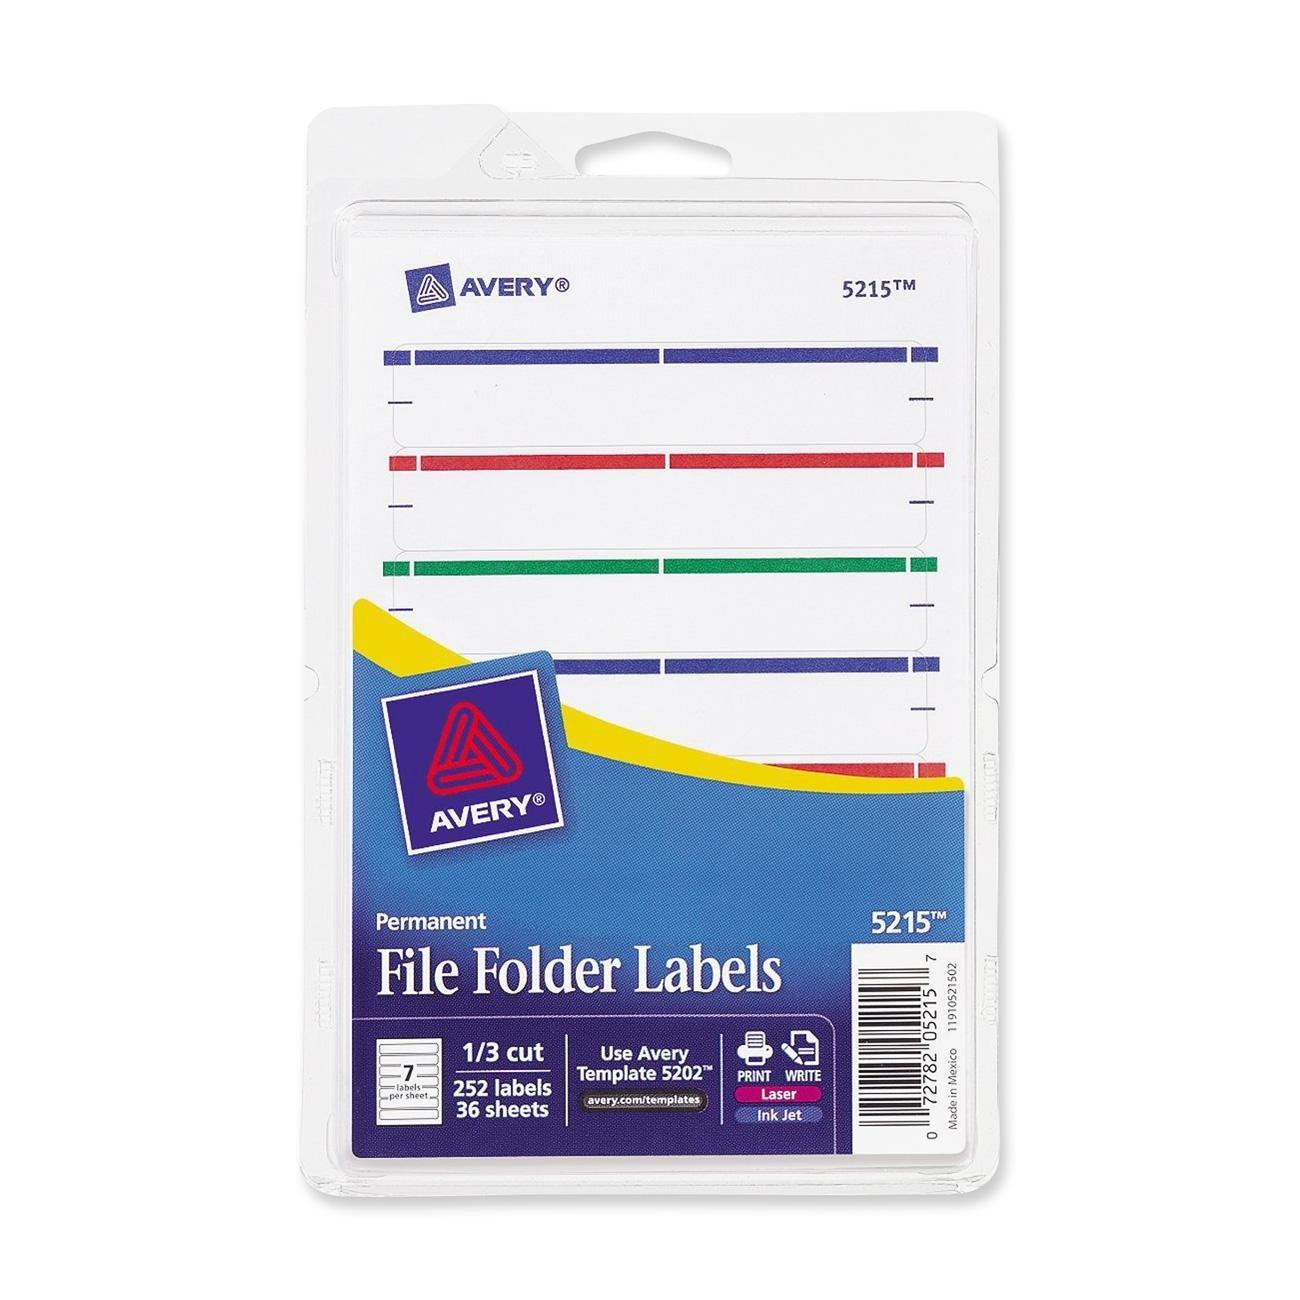 Avery File Folder Label Templates For Mac